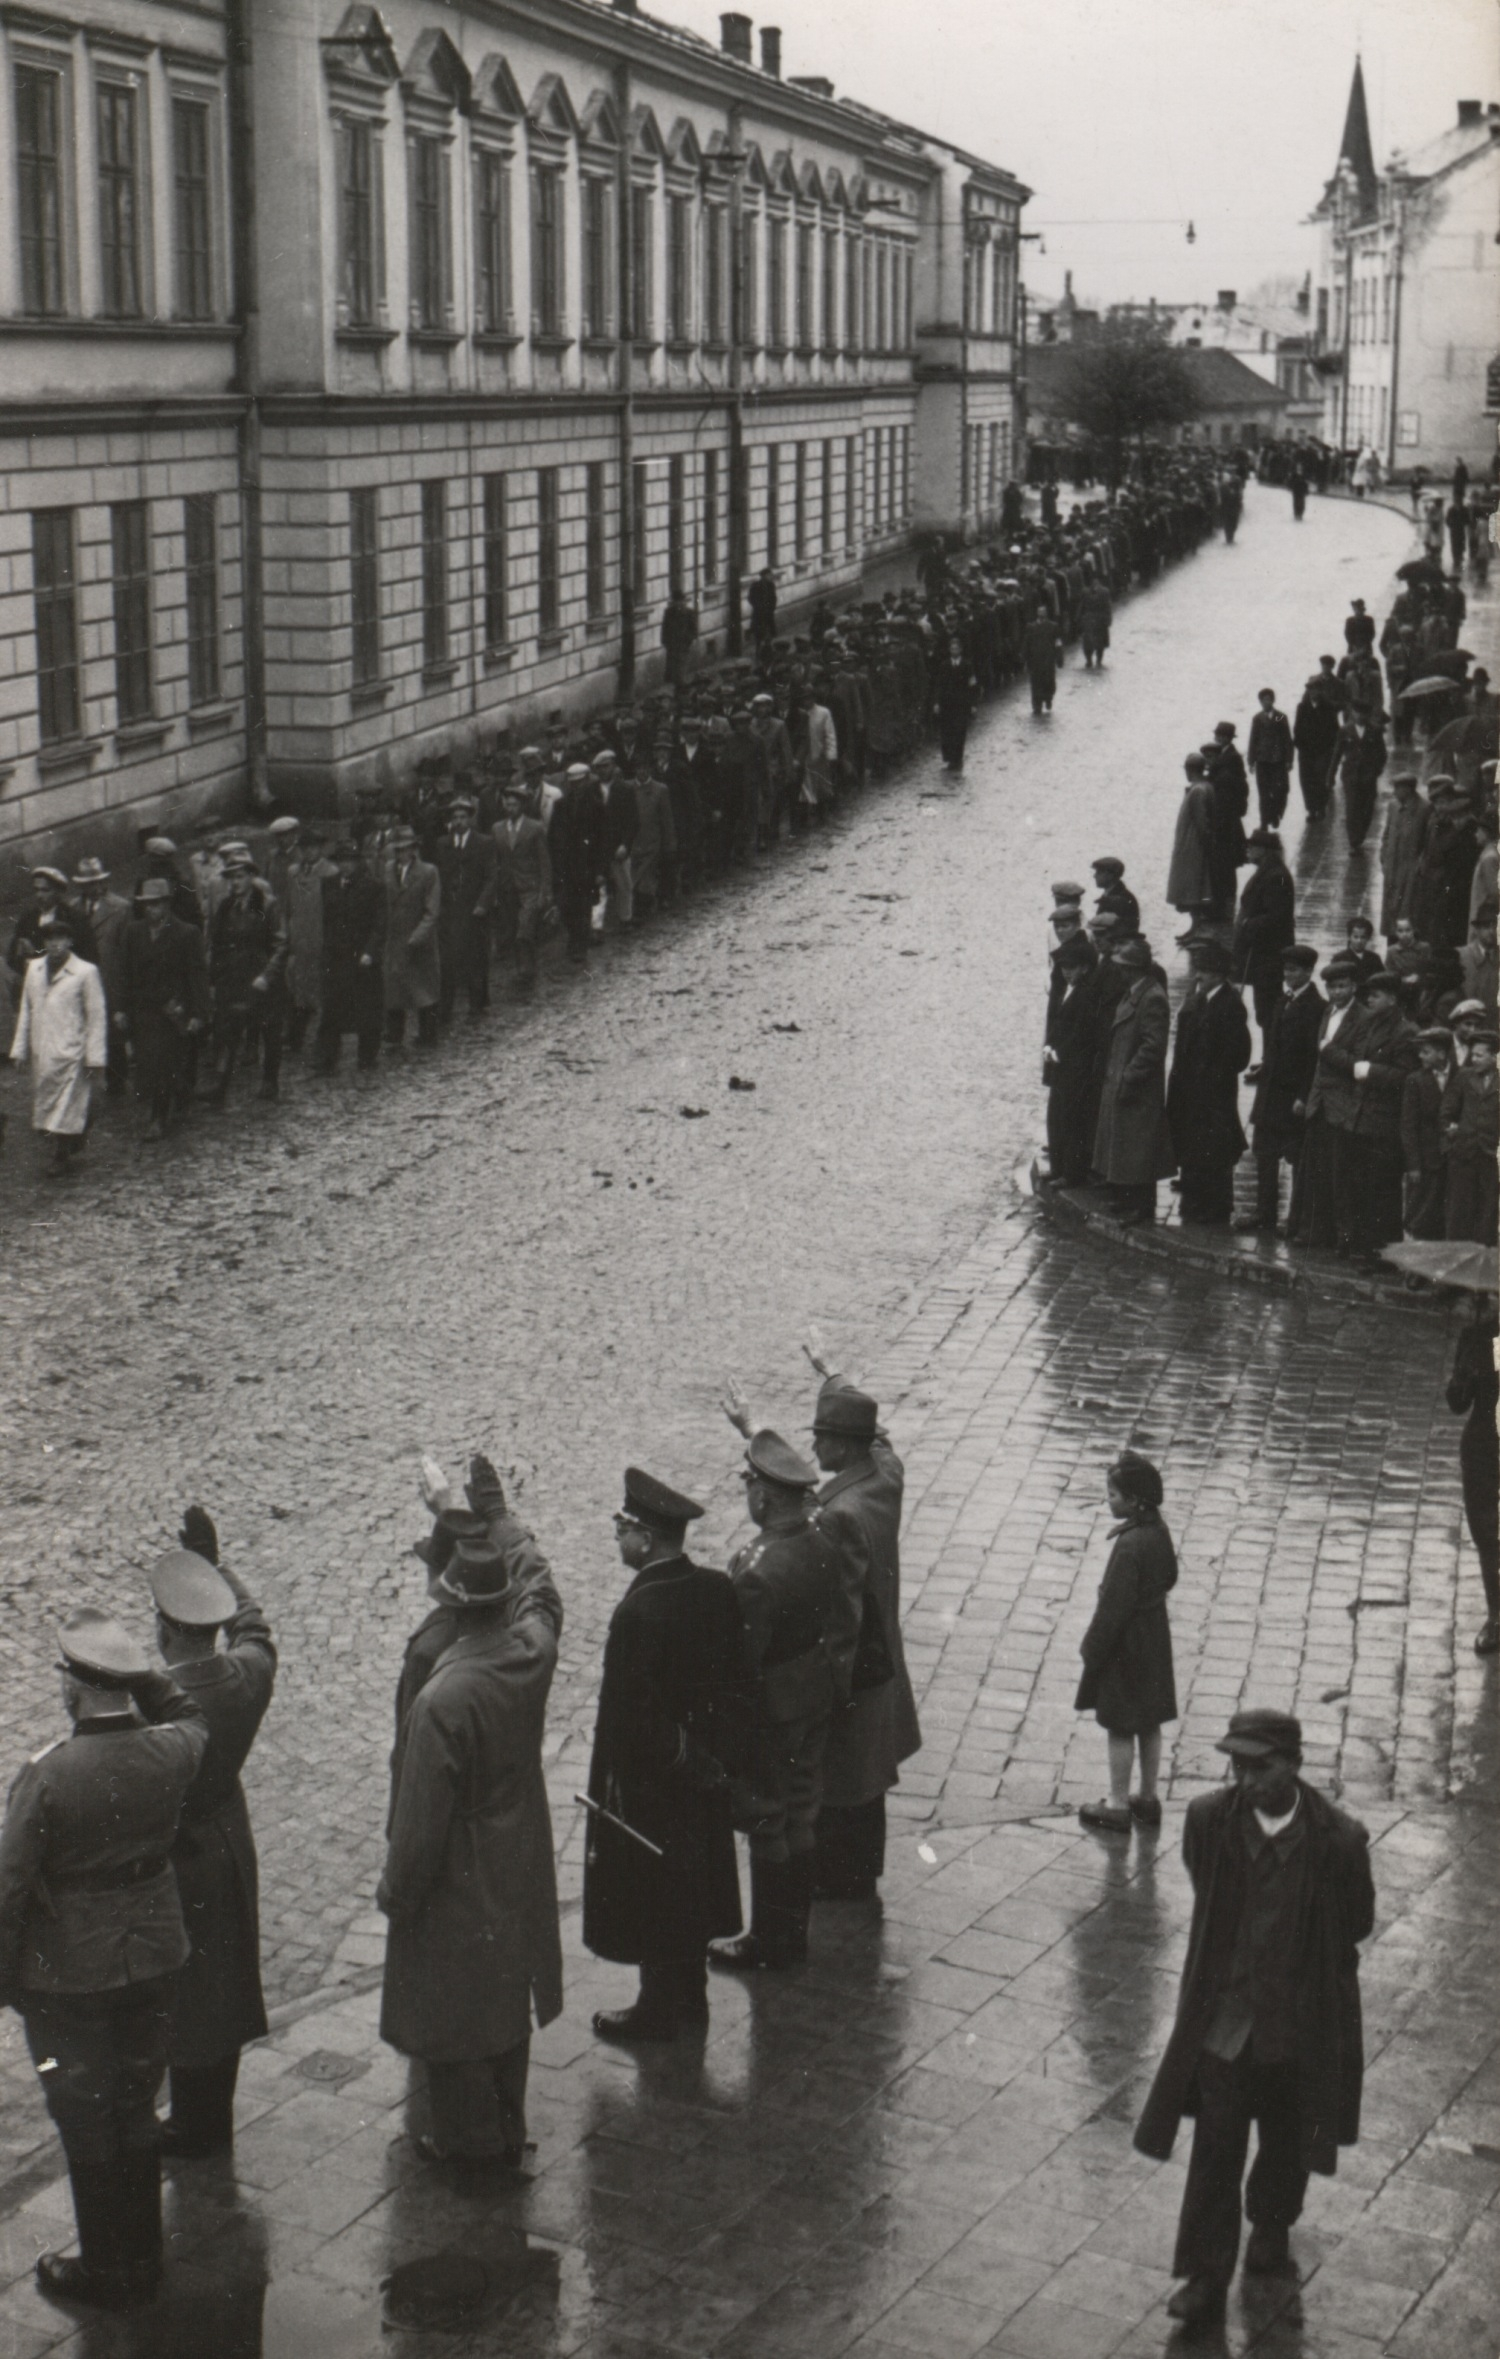 File:1943sanok kosciuszki ukr ss.jpg - Wikimedia Commons